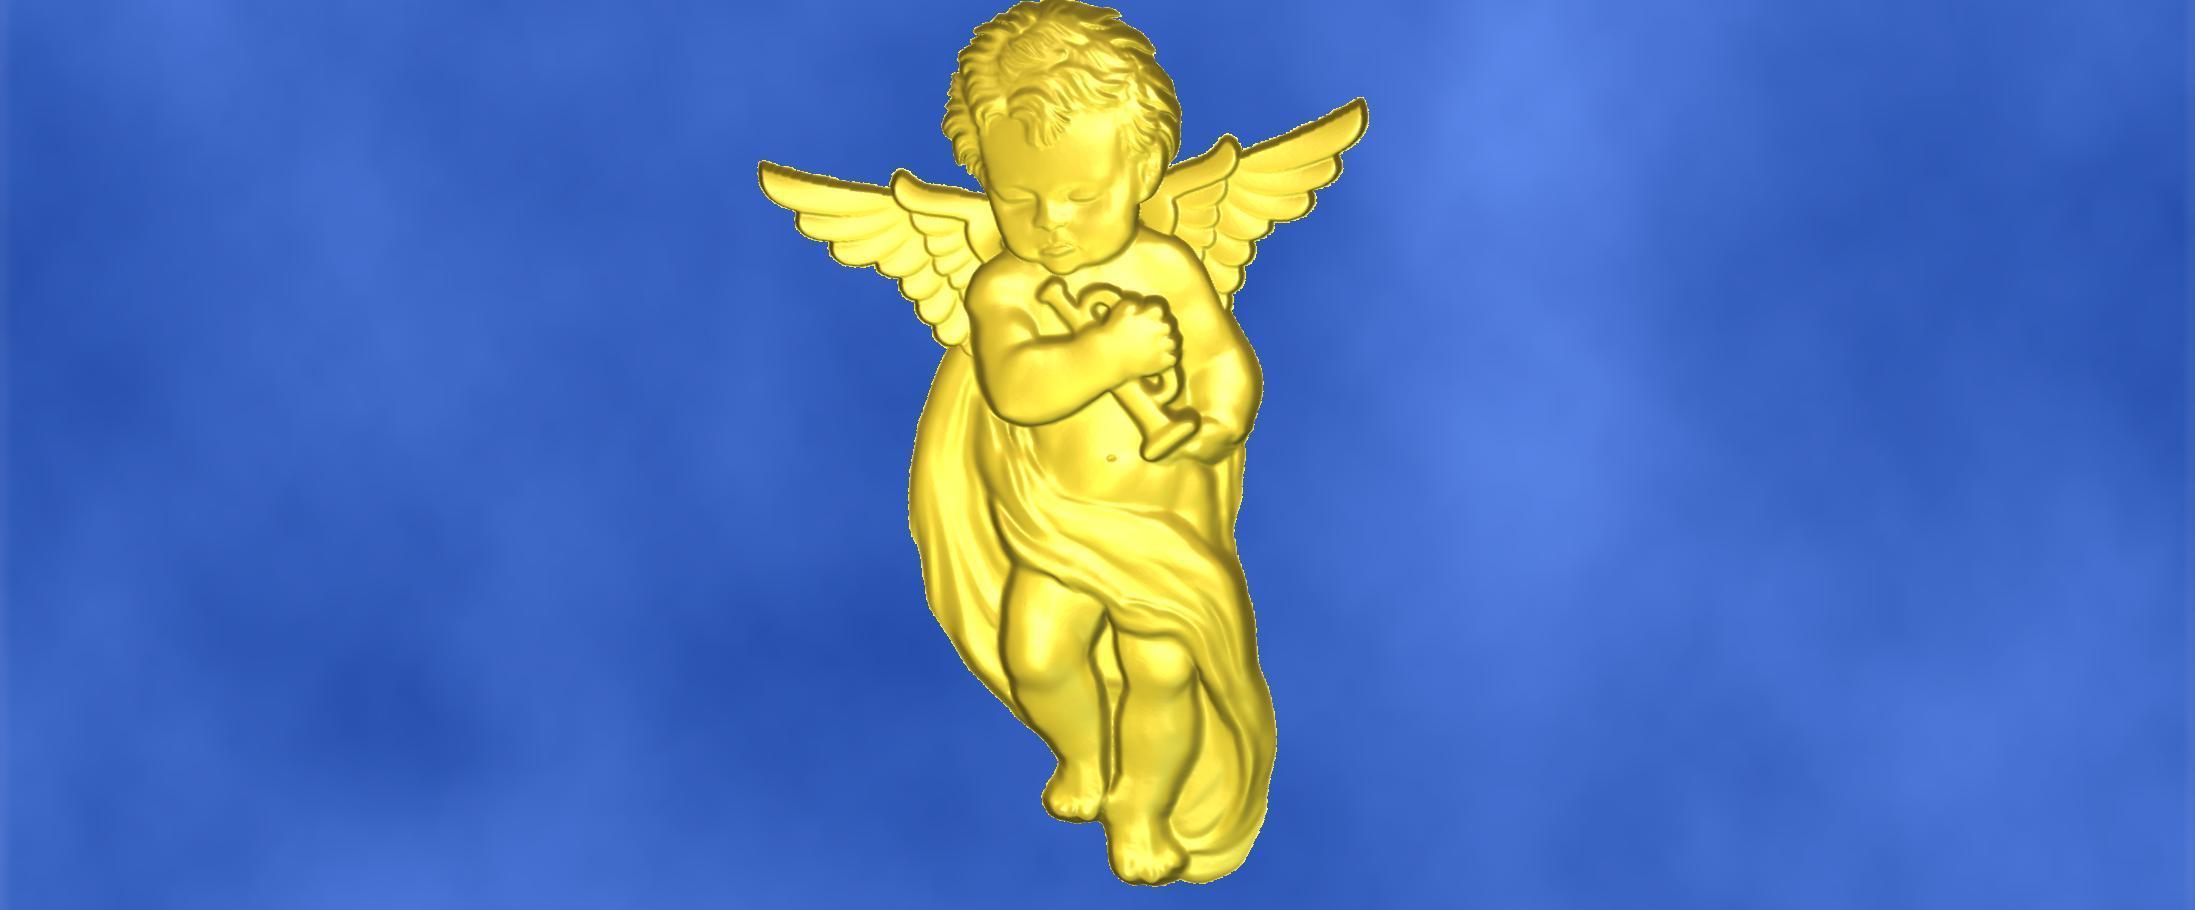 12.jpg Download free STL file 3D STL MODEL CHERUB  • 3D print model, ALPHA_MENA